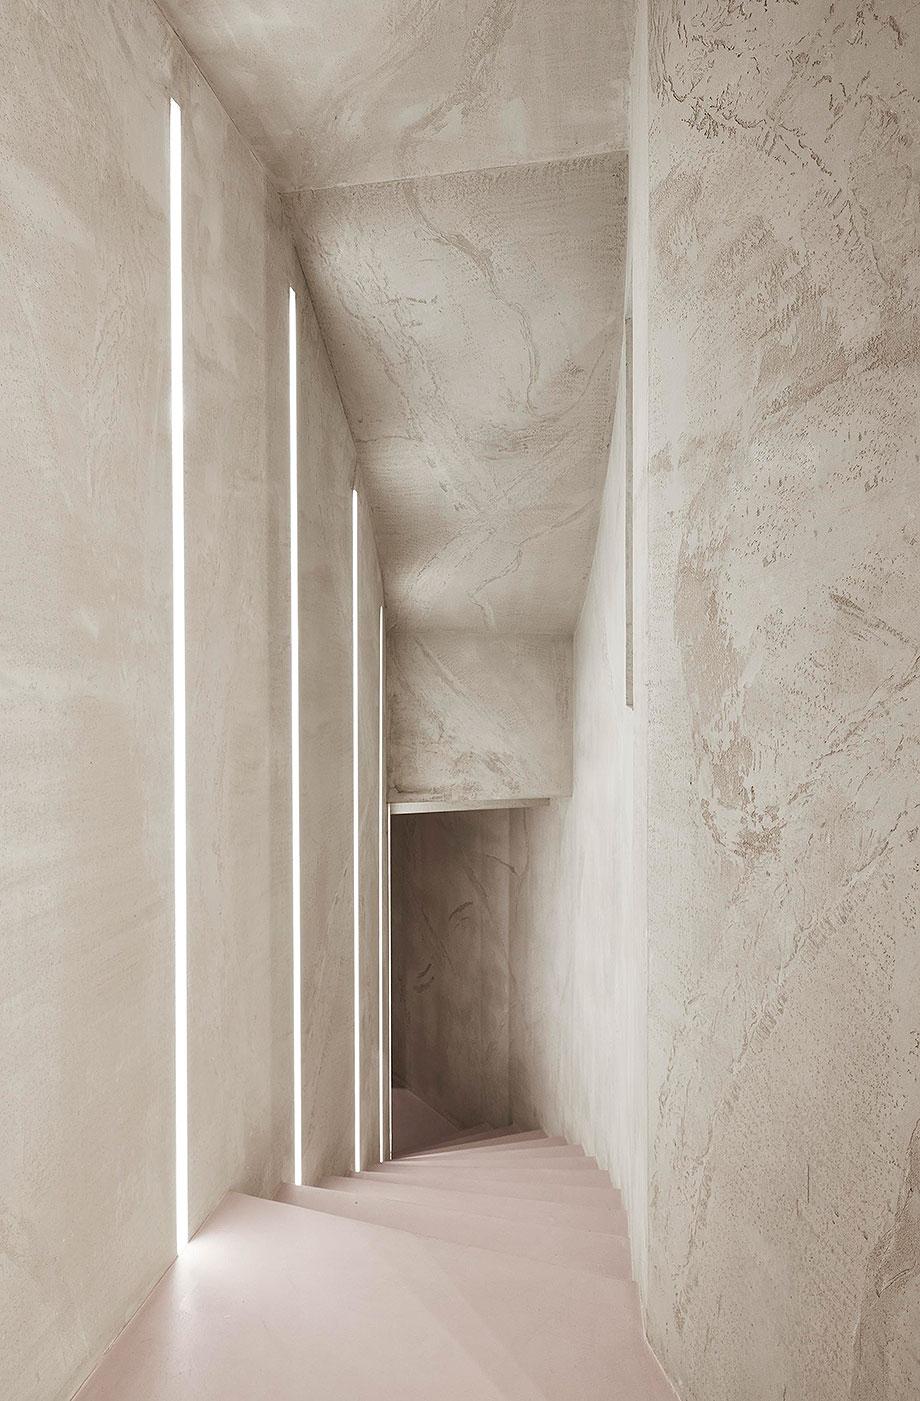 camaleonica vivienda en ibiza por minimal studio (6) - foto art sanchez photography